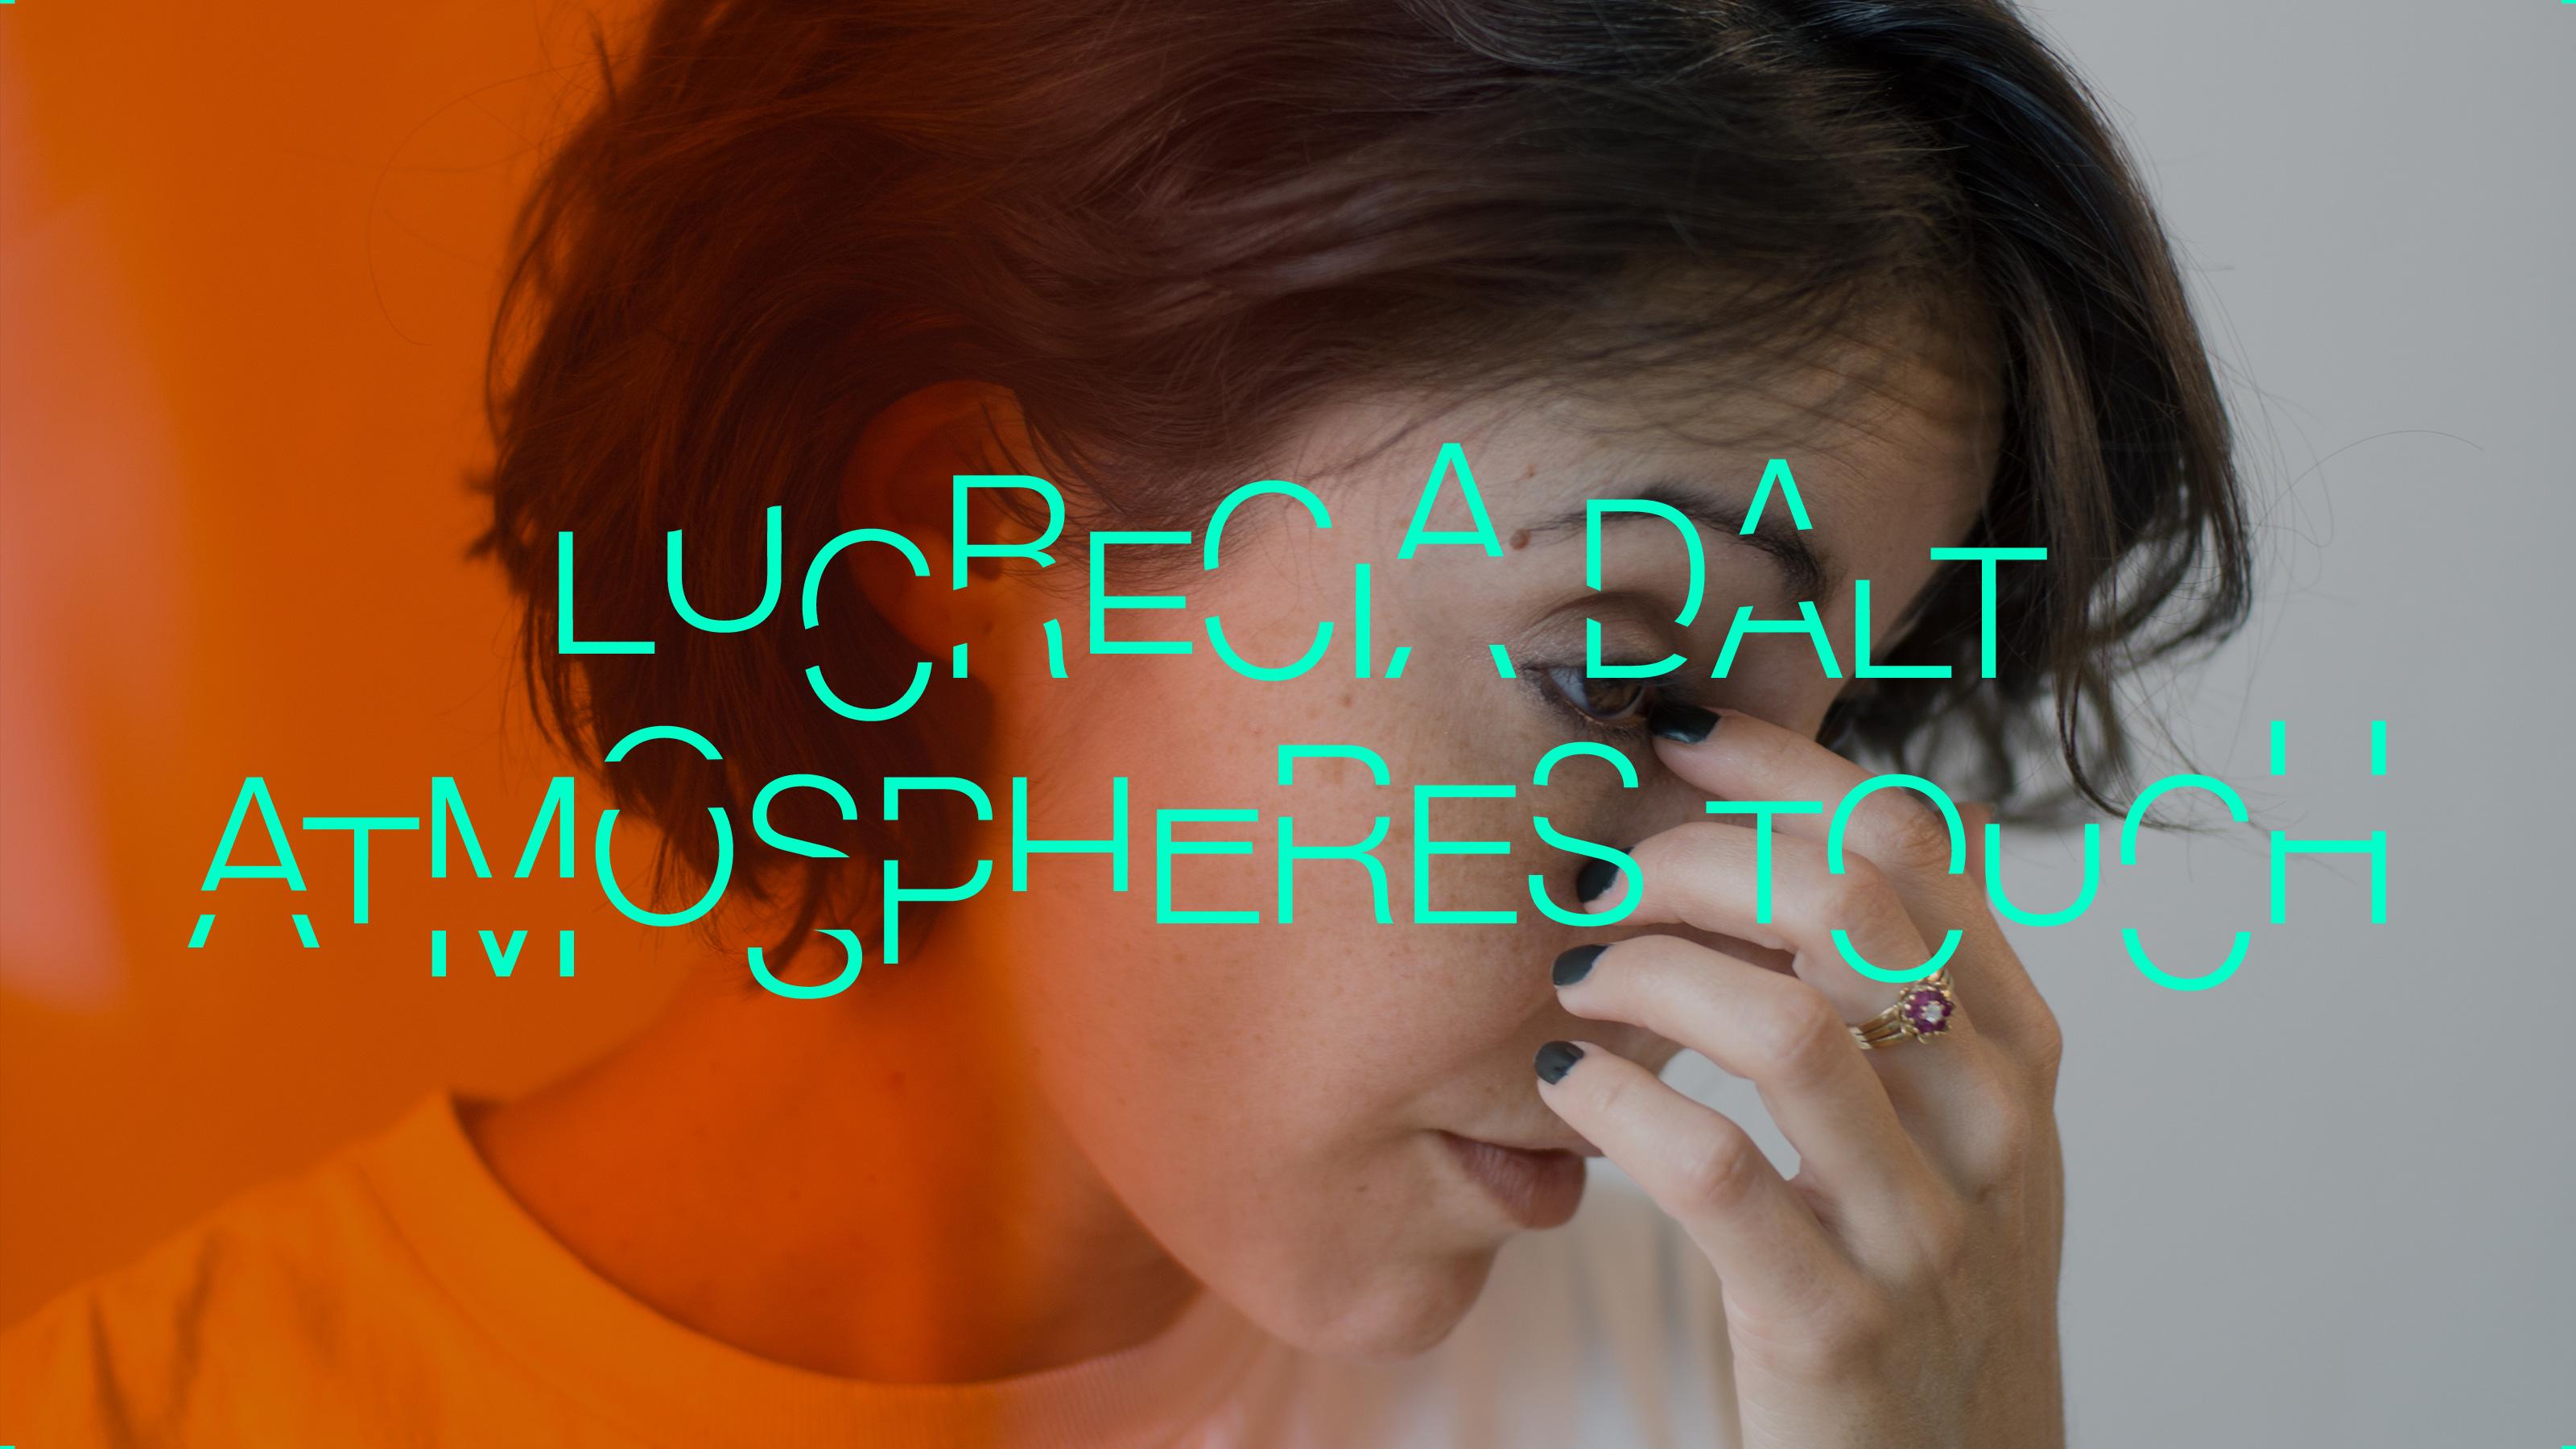 Ra Lucrecia Dalt Atmospheres Touch